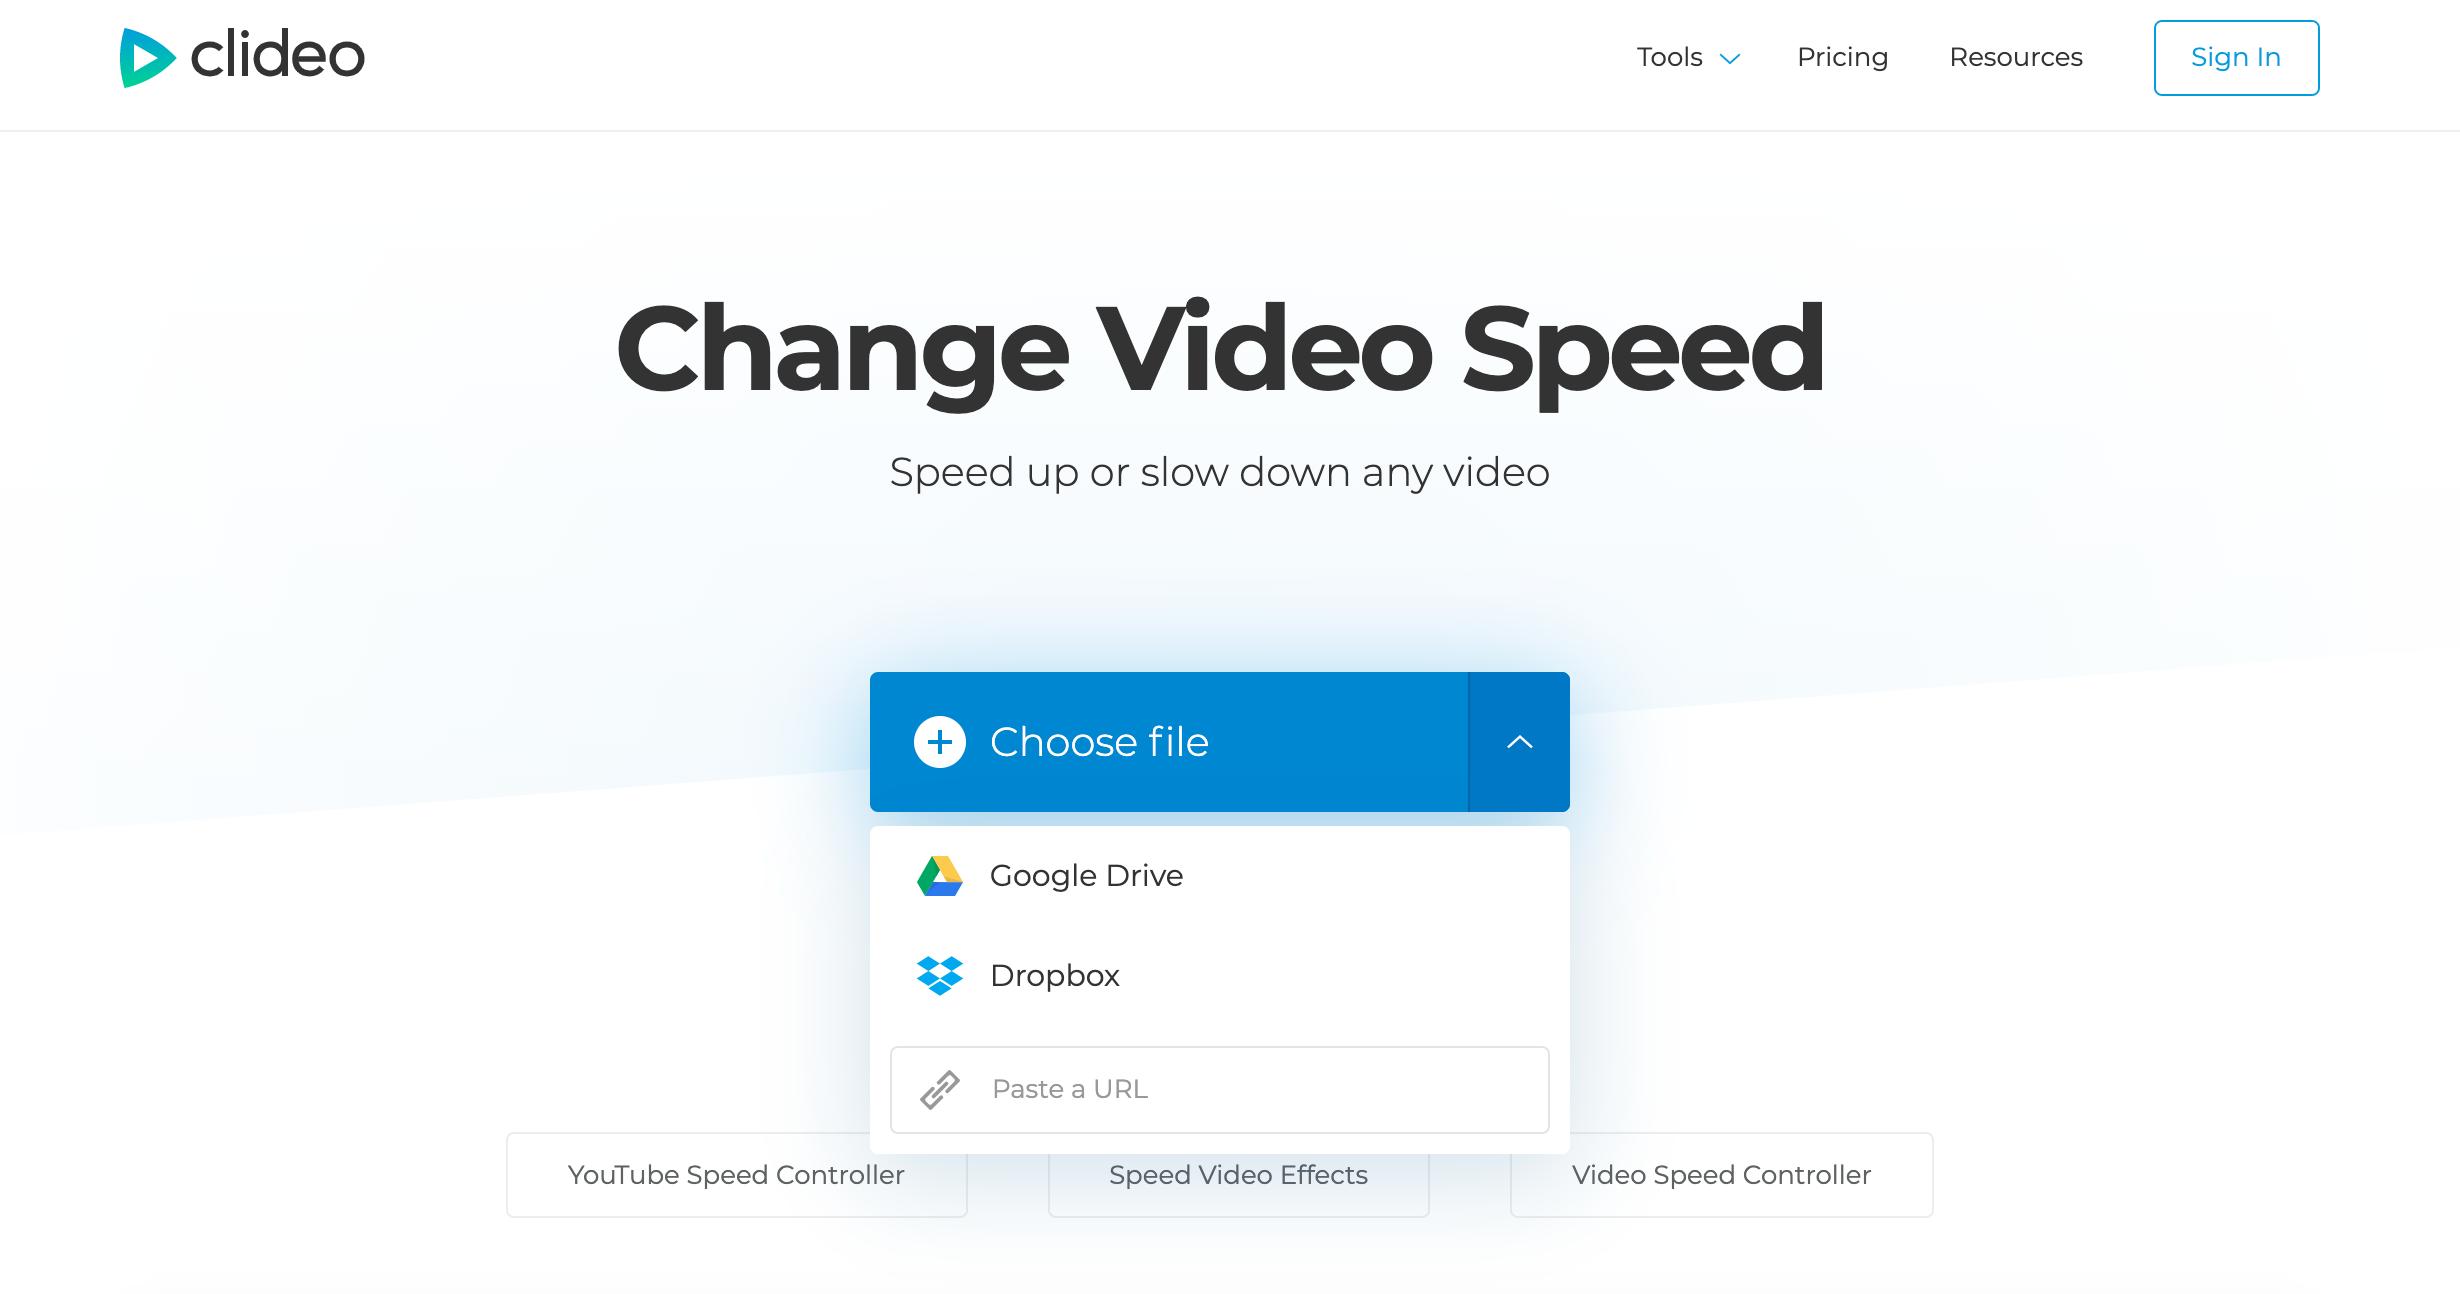 Upload video to make timelapse